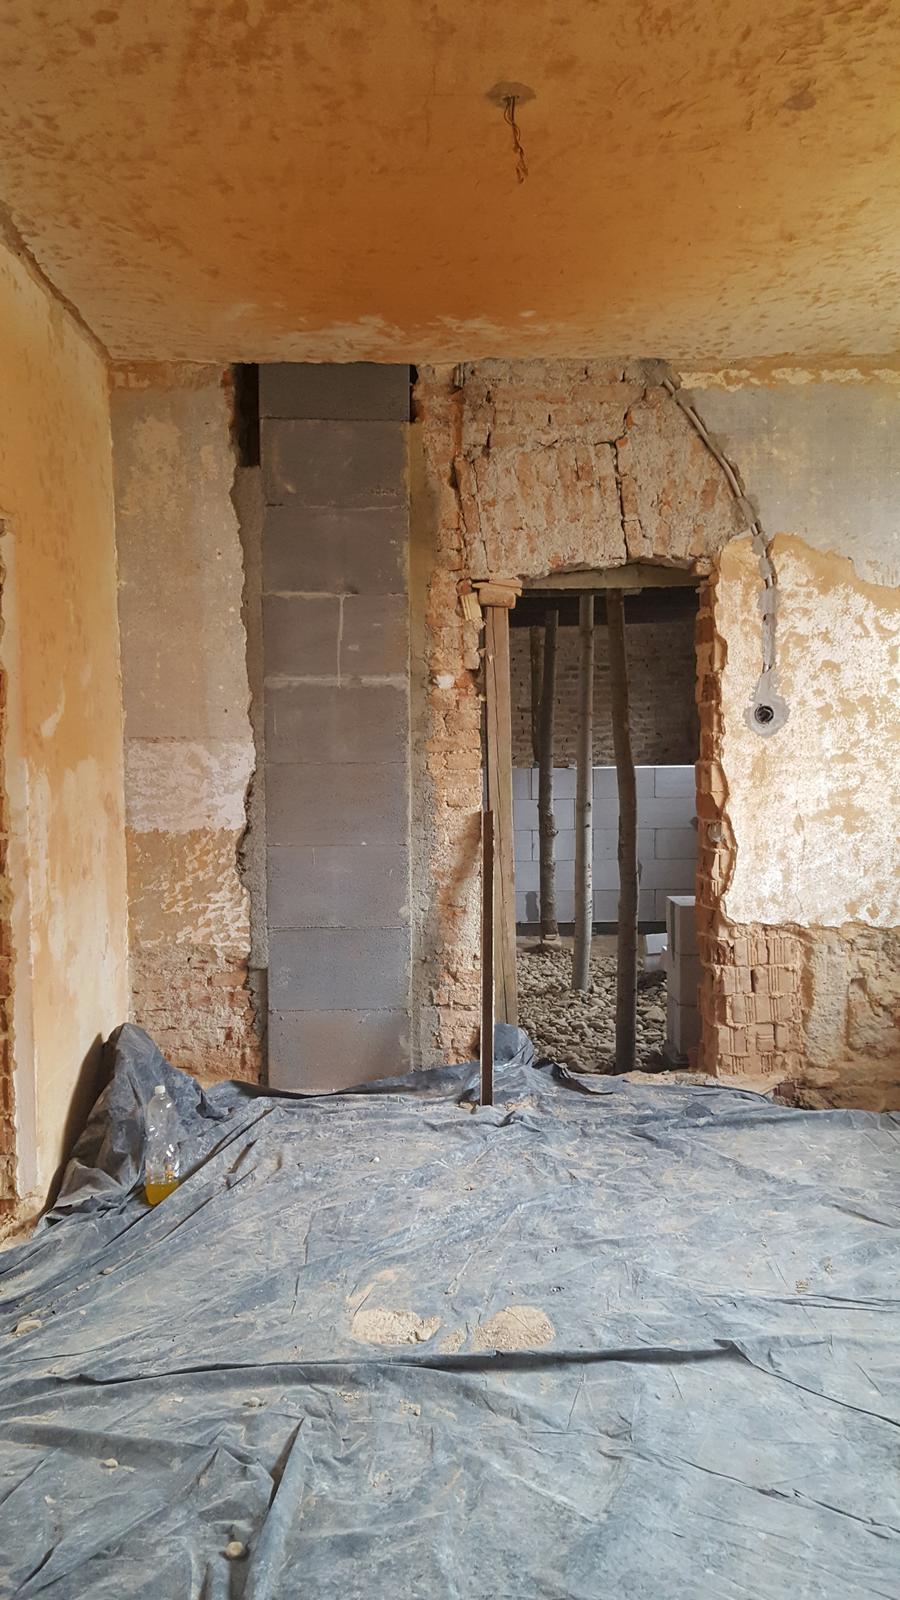 Prerabka domu v historickom centre - komin konecne nad urovnou kuchyne, uz len pripravit spodne odsavanie pre digestor